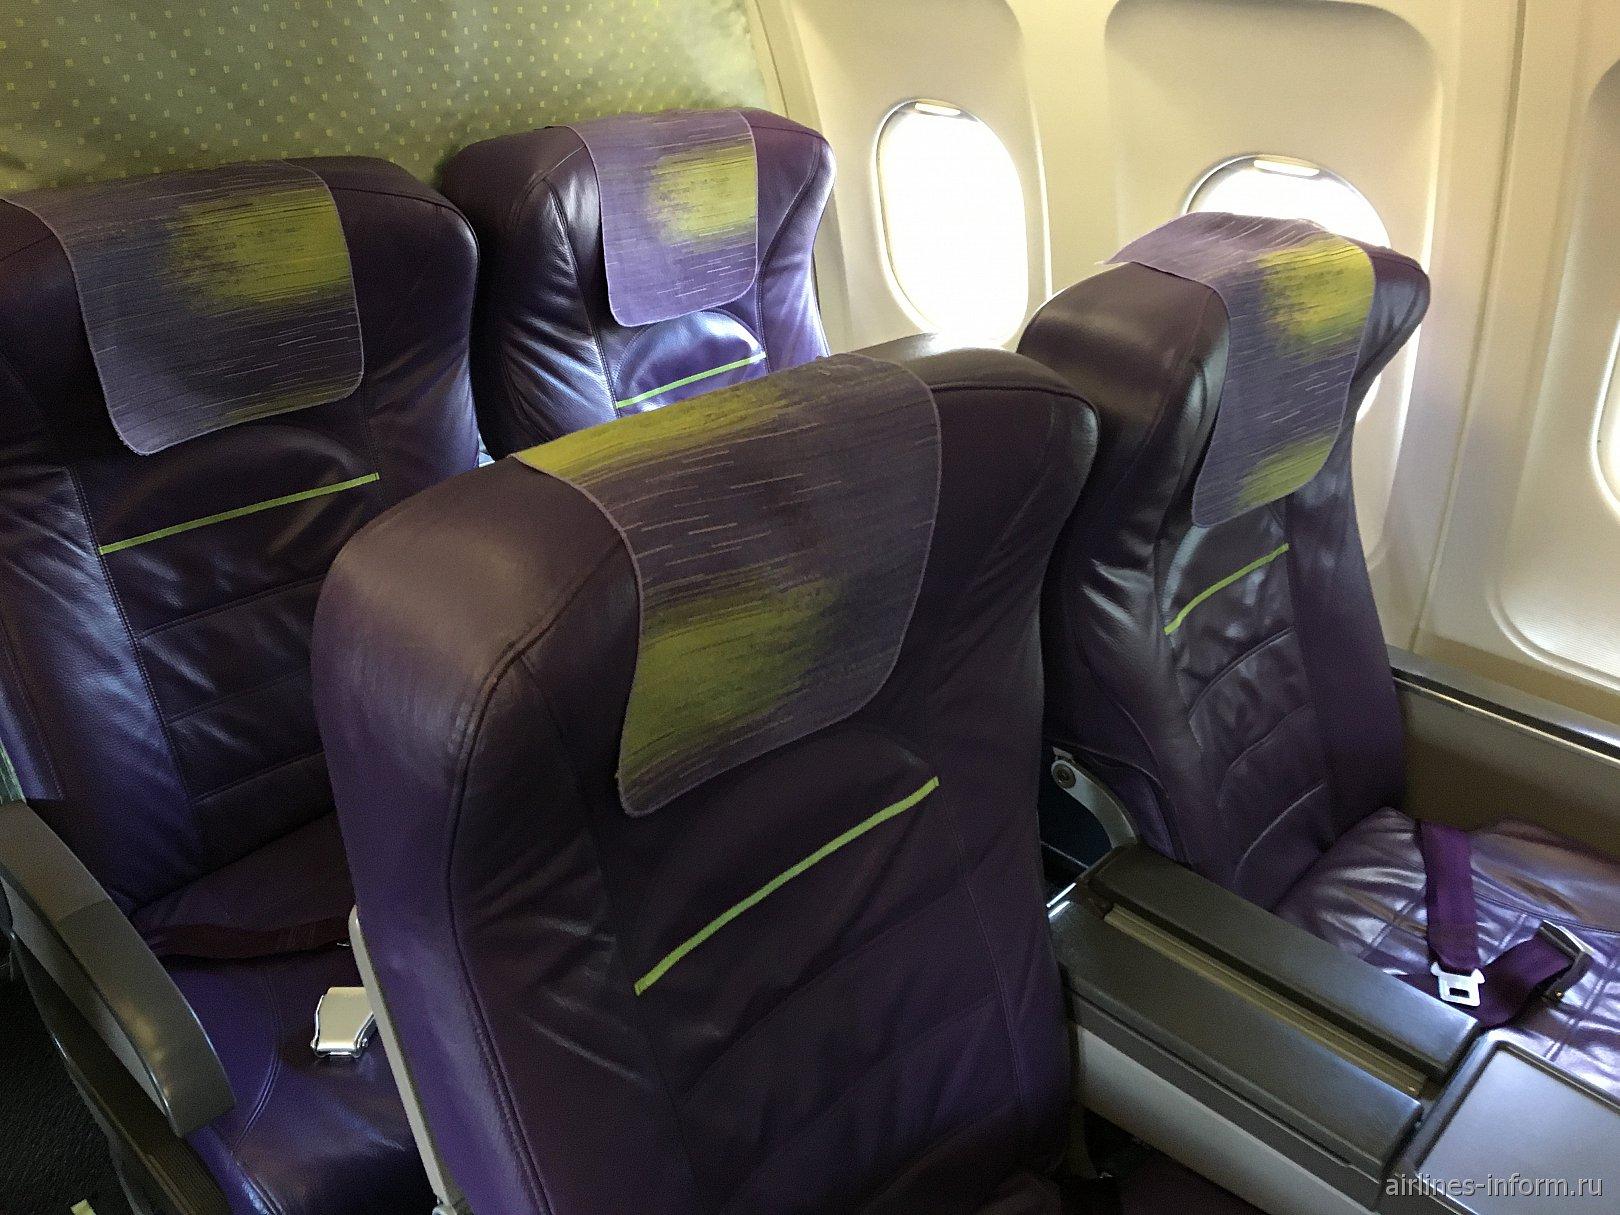 Кресла бизнес-класса в самолете Airbus A319 авиакомпании S7 Airlines